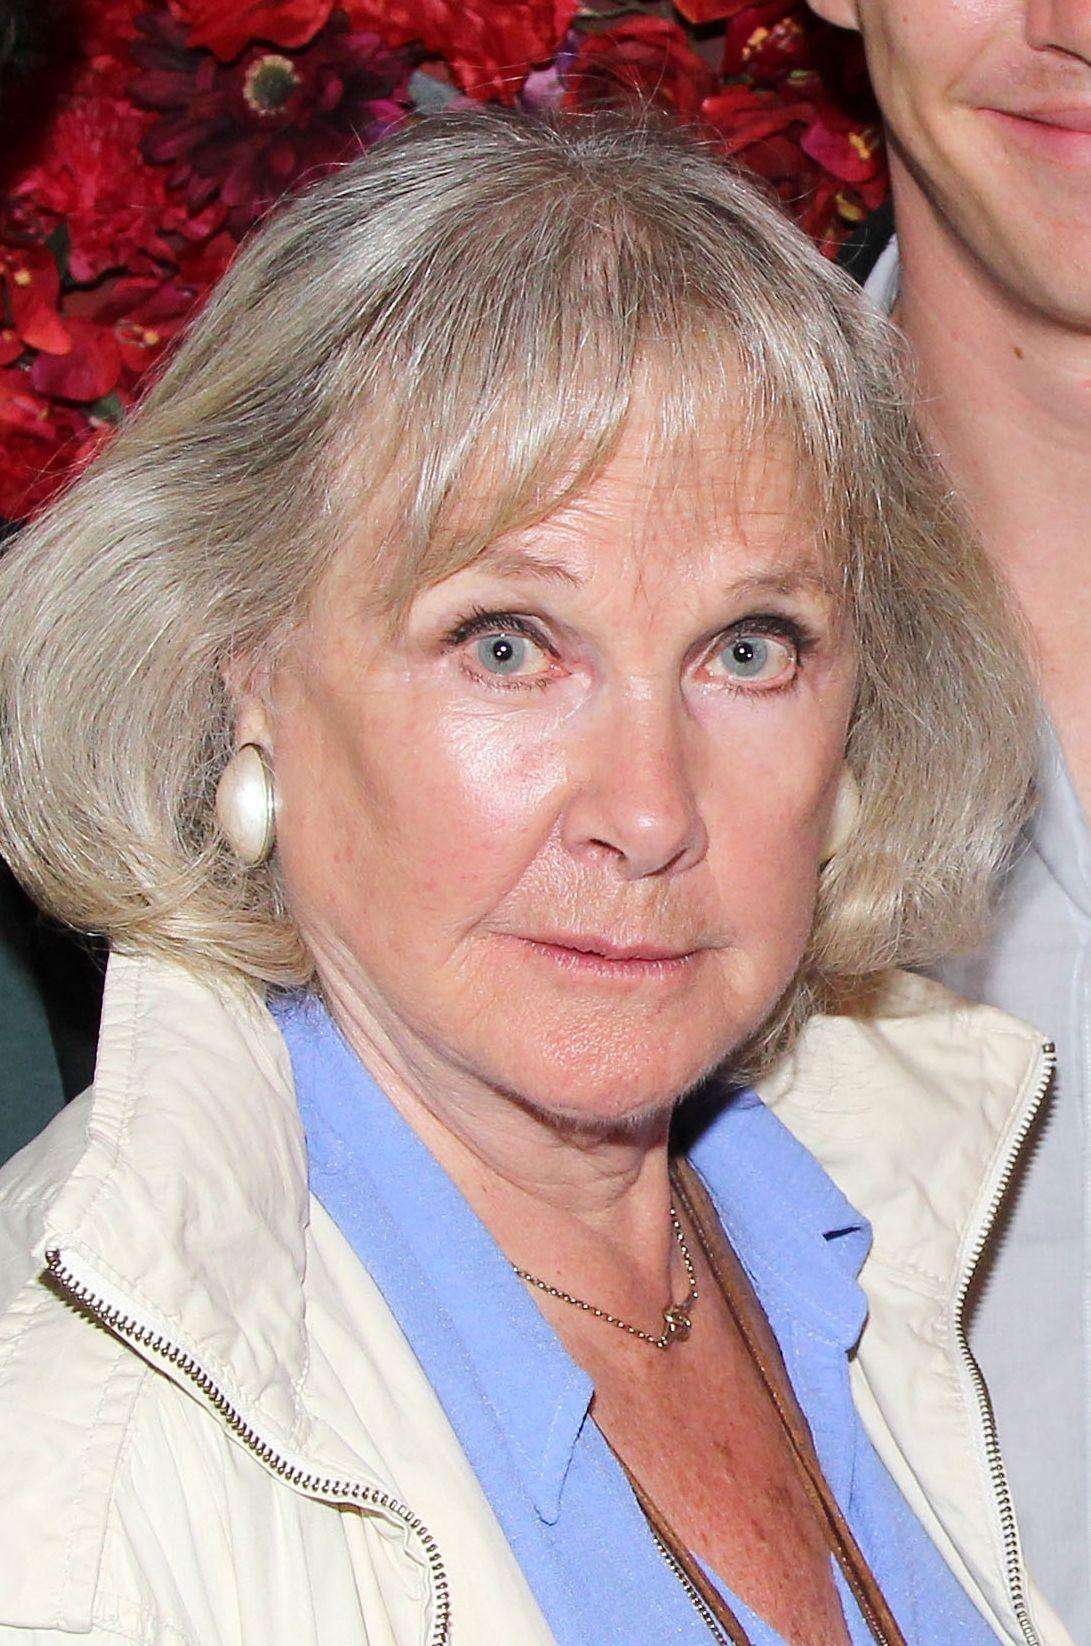 Christine Taylor,Therese McMurray Hot videos Scarlett Strallen,Kika Markham (born 1940)